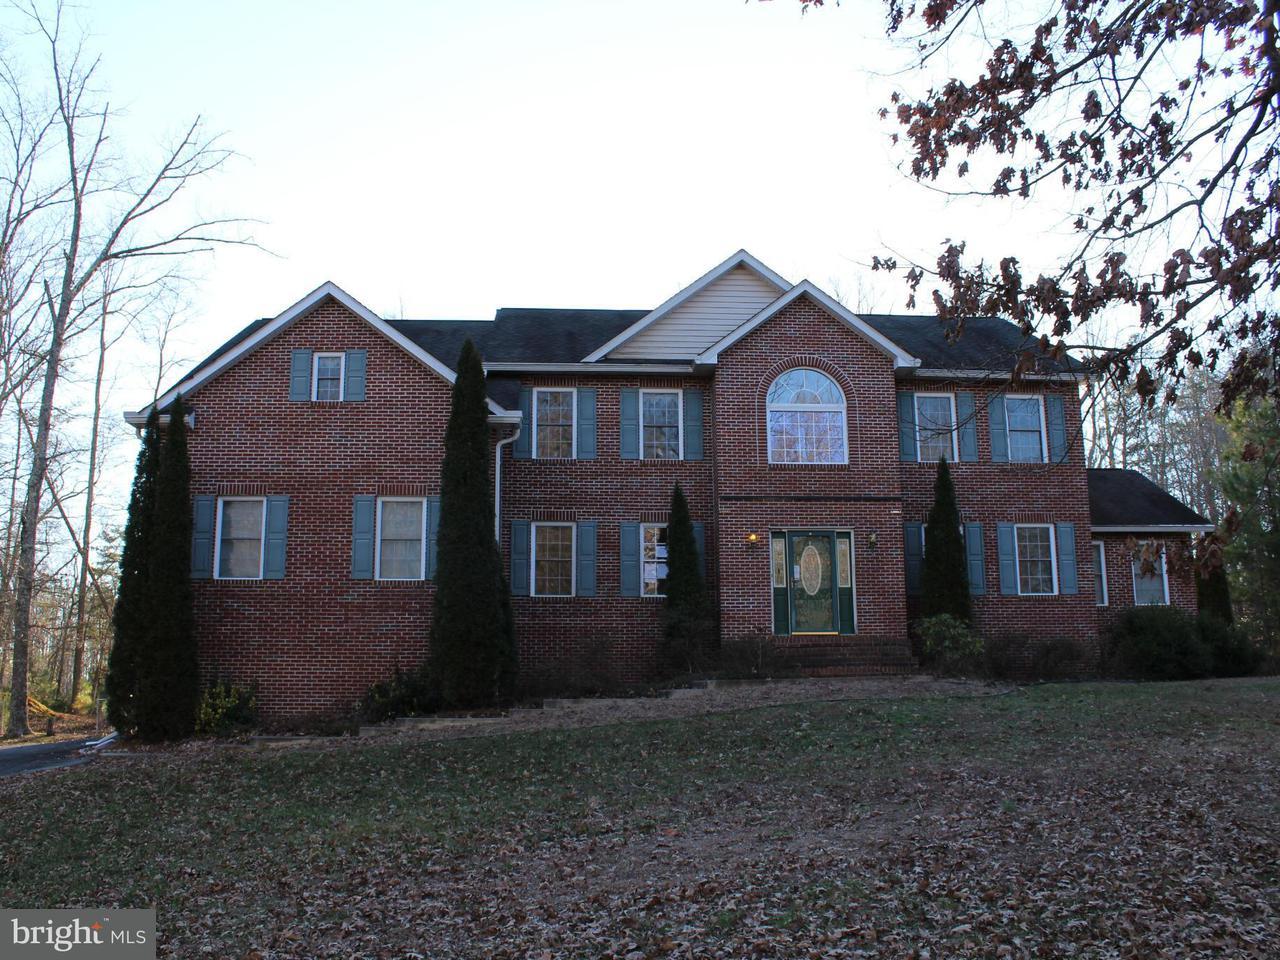 Частный односемейный дом для того Продажа на 6826 BUCKEYE Drive 6826 BUCKEYE Drive Hughesville, Мэриленд 20637 Соединенные Штаты